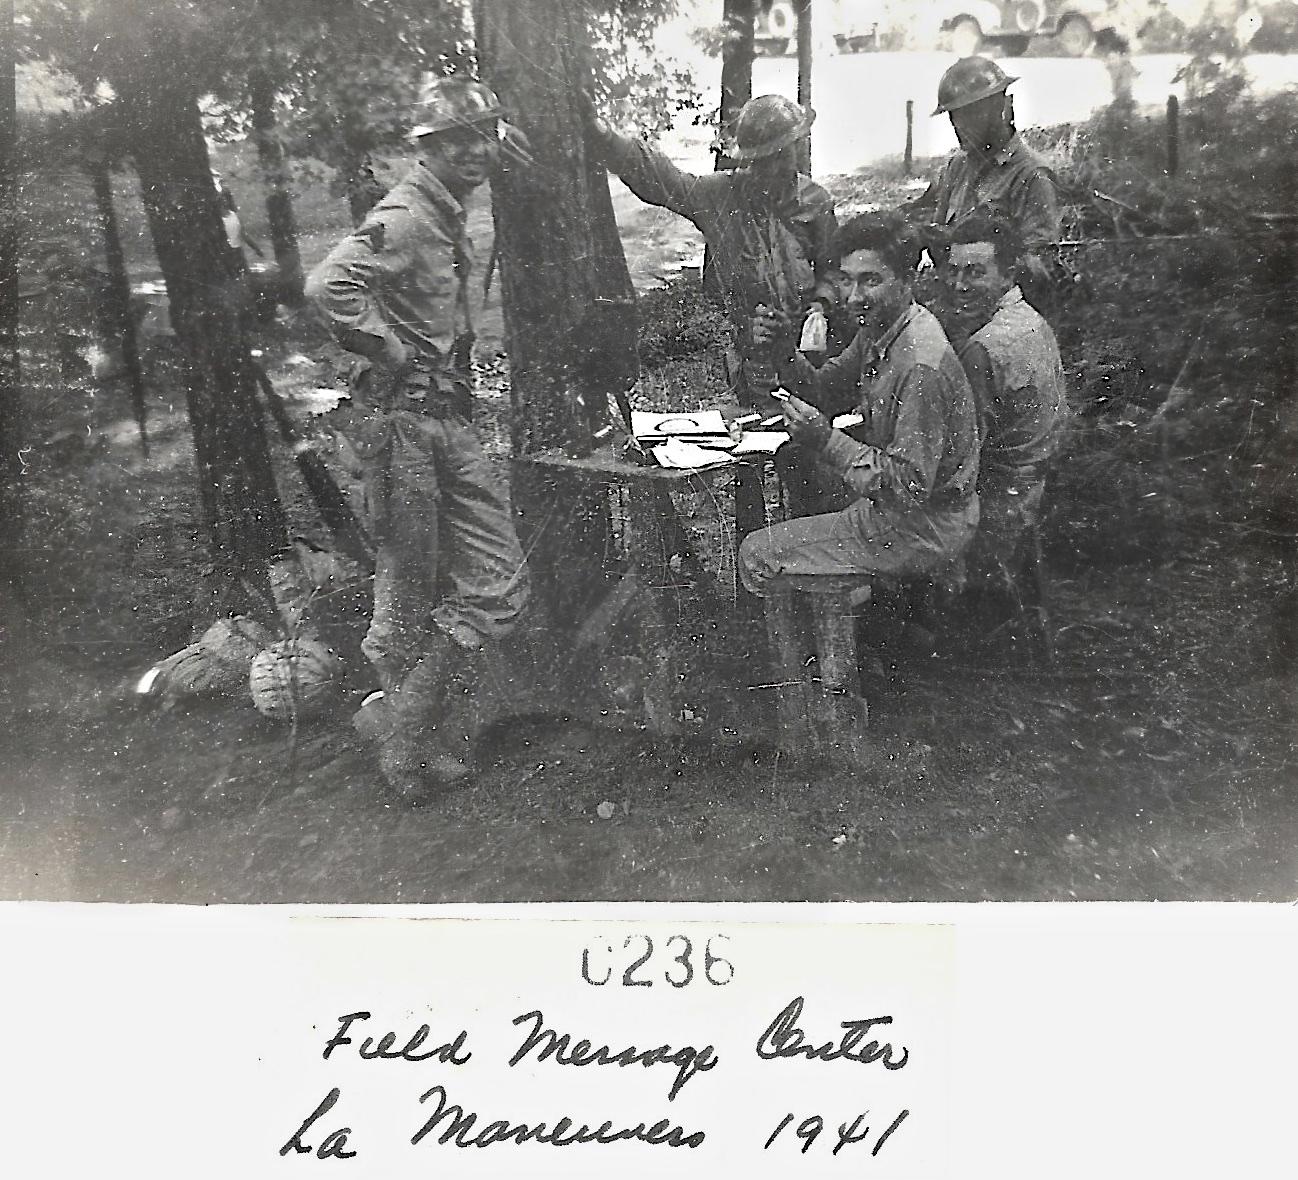 1941 Louisiana Maneuvers Field Message Center